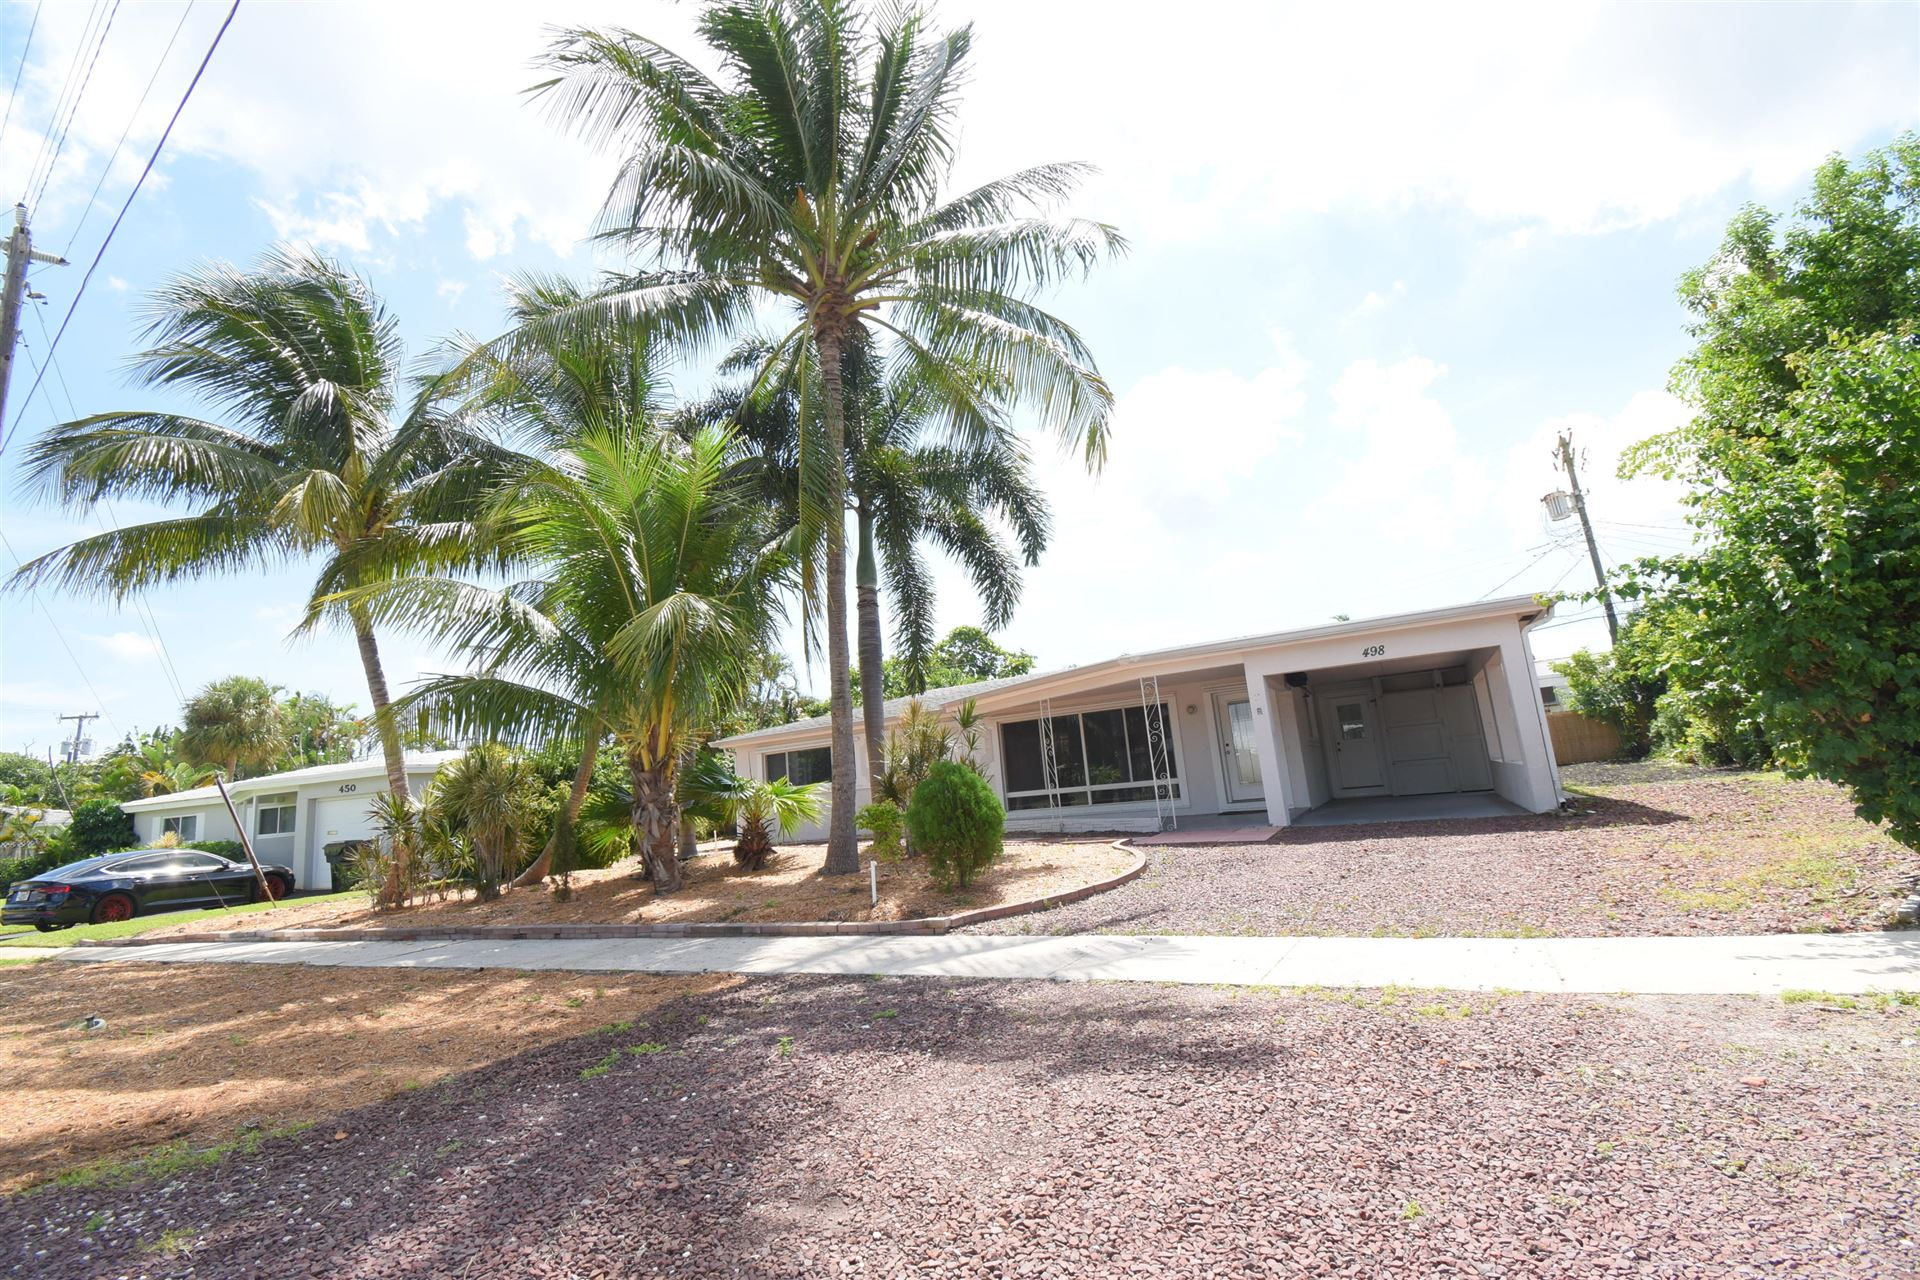 Photo of 498 NE 5th Circle, Boca Raton, FL 33431 (MLS # RX-10658176)